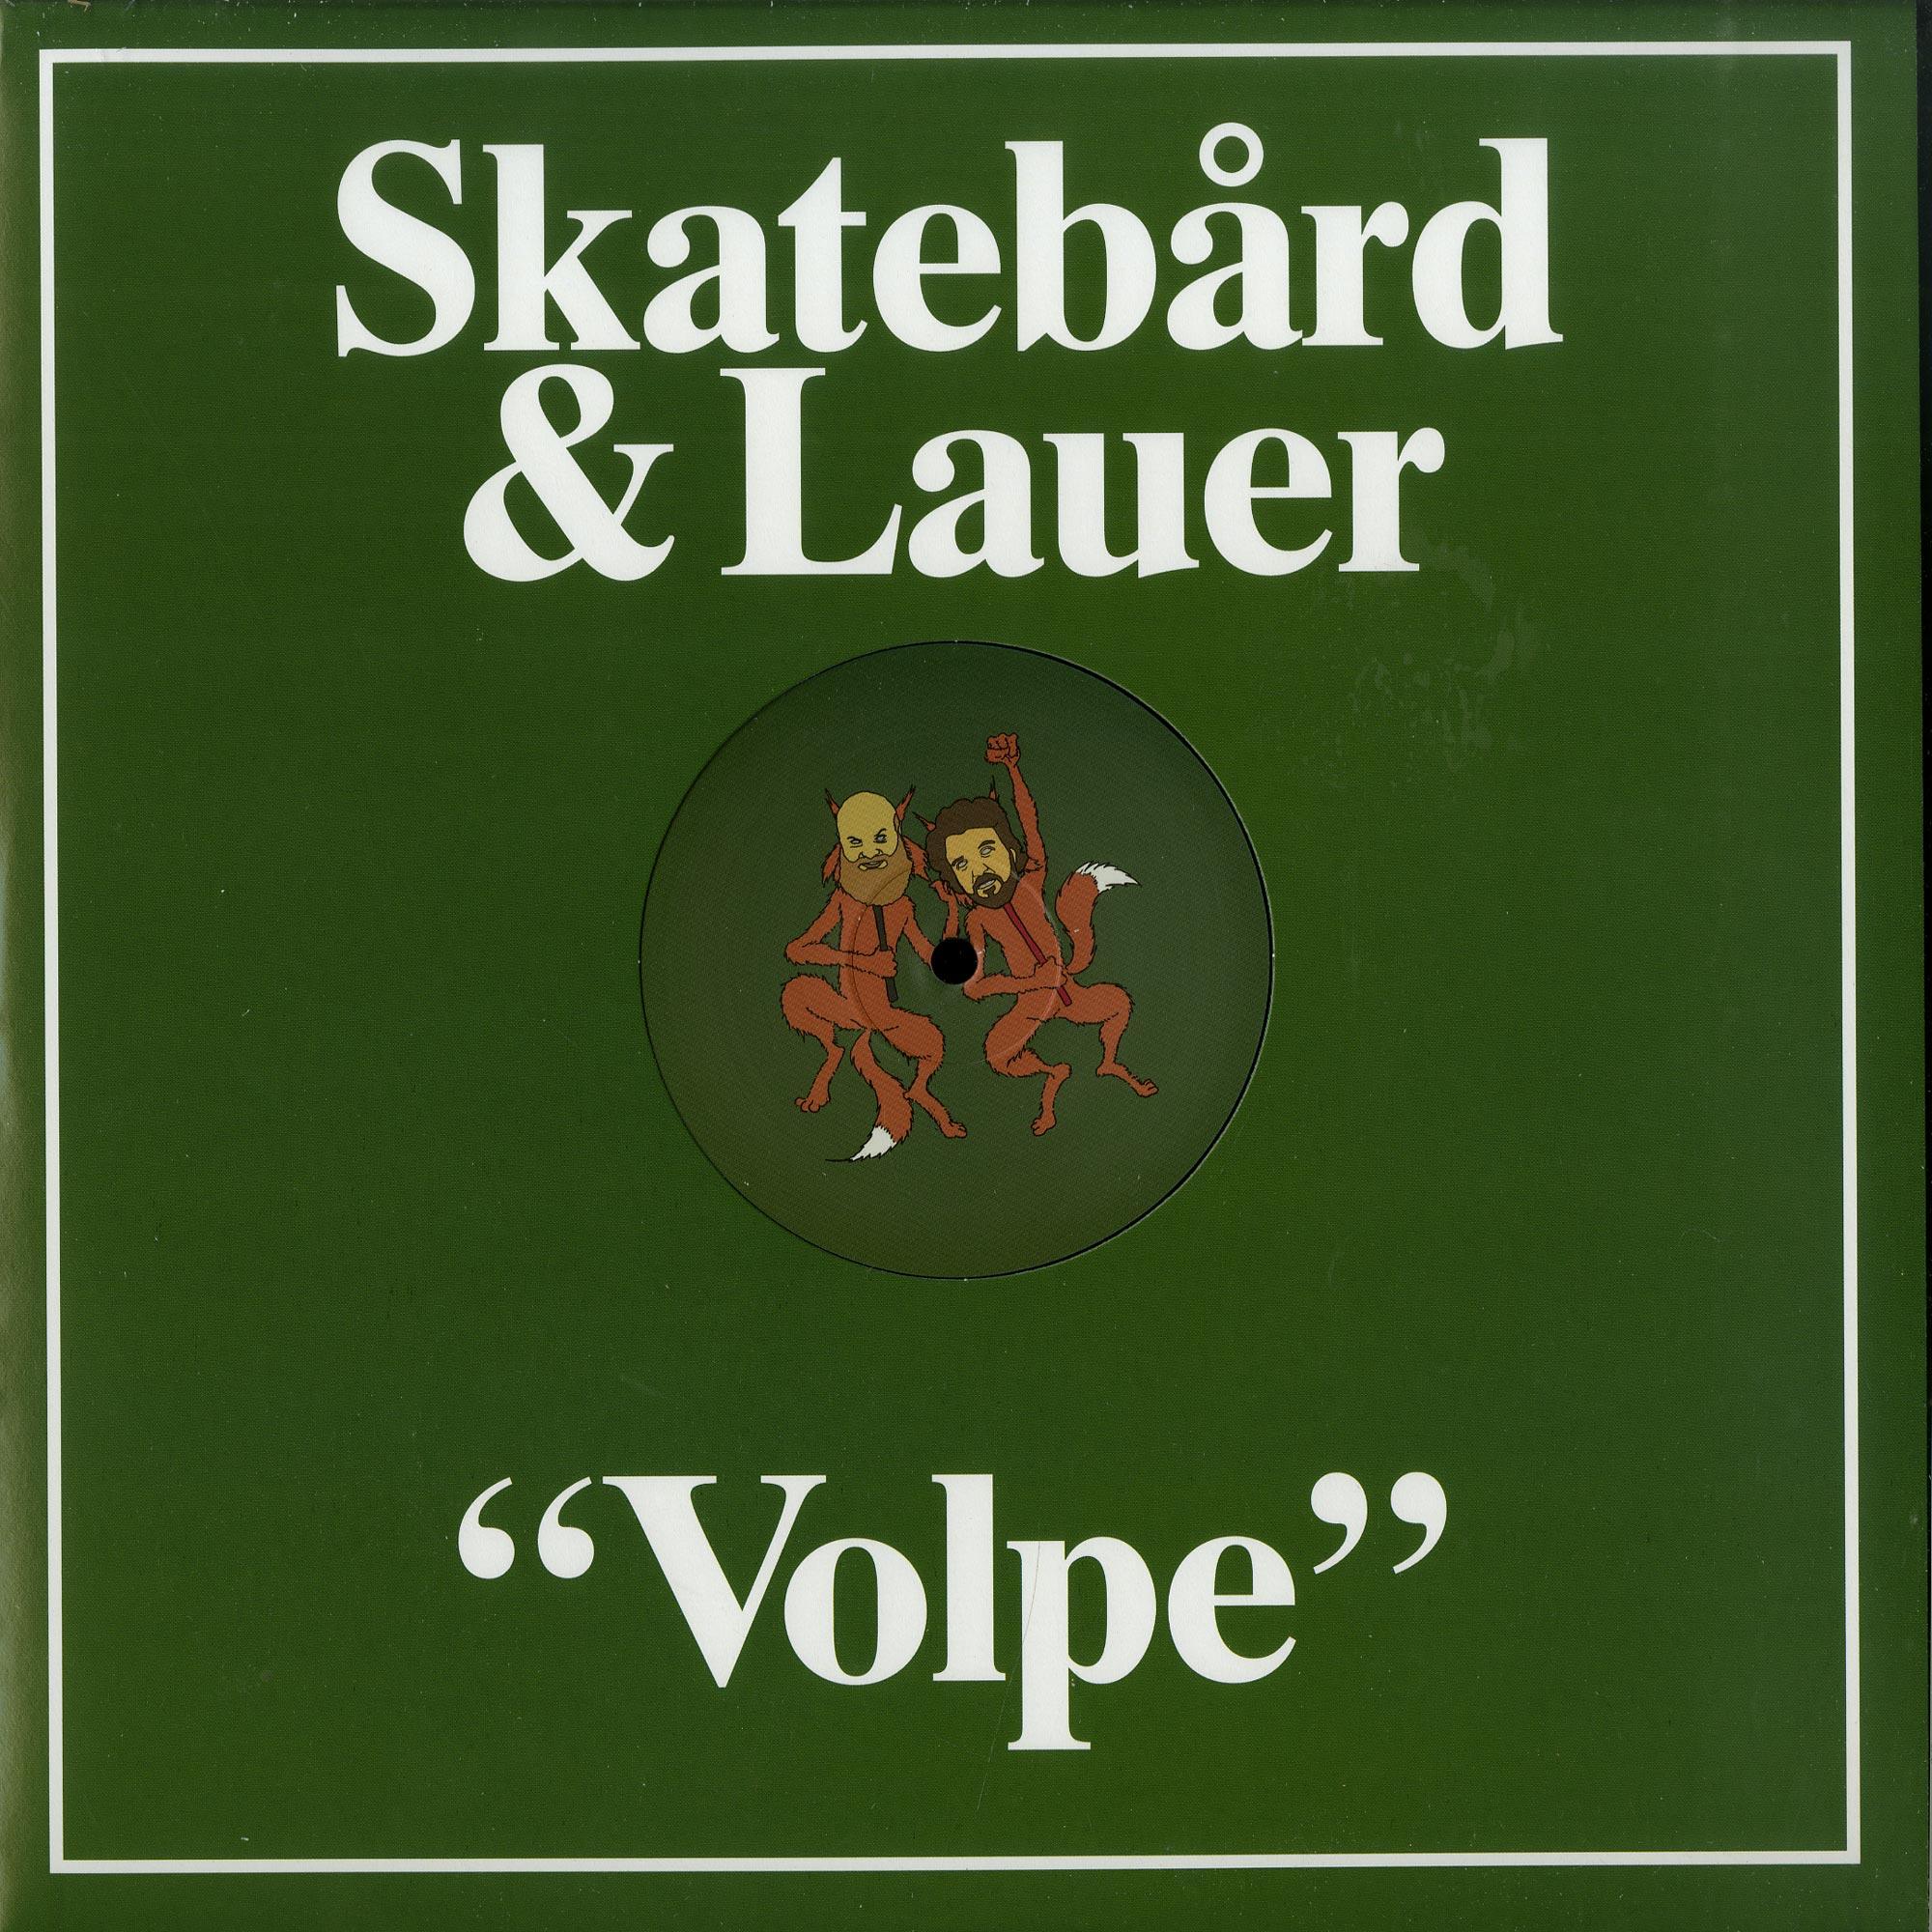 Skatebard & Lauer - VOLPE